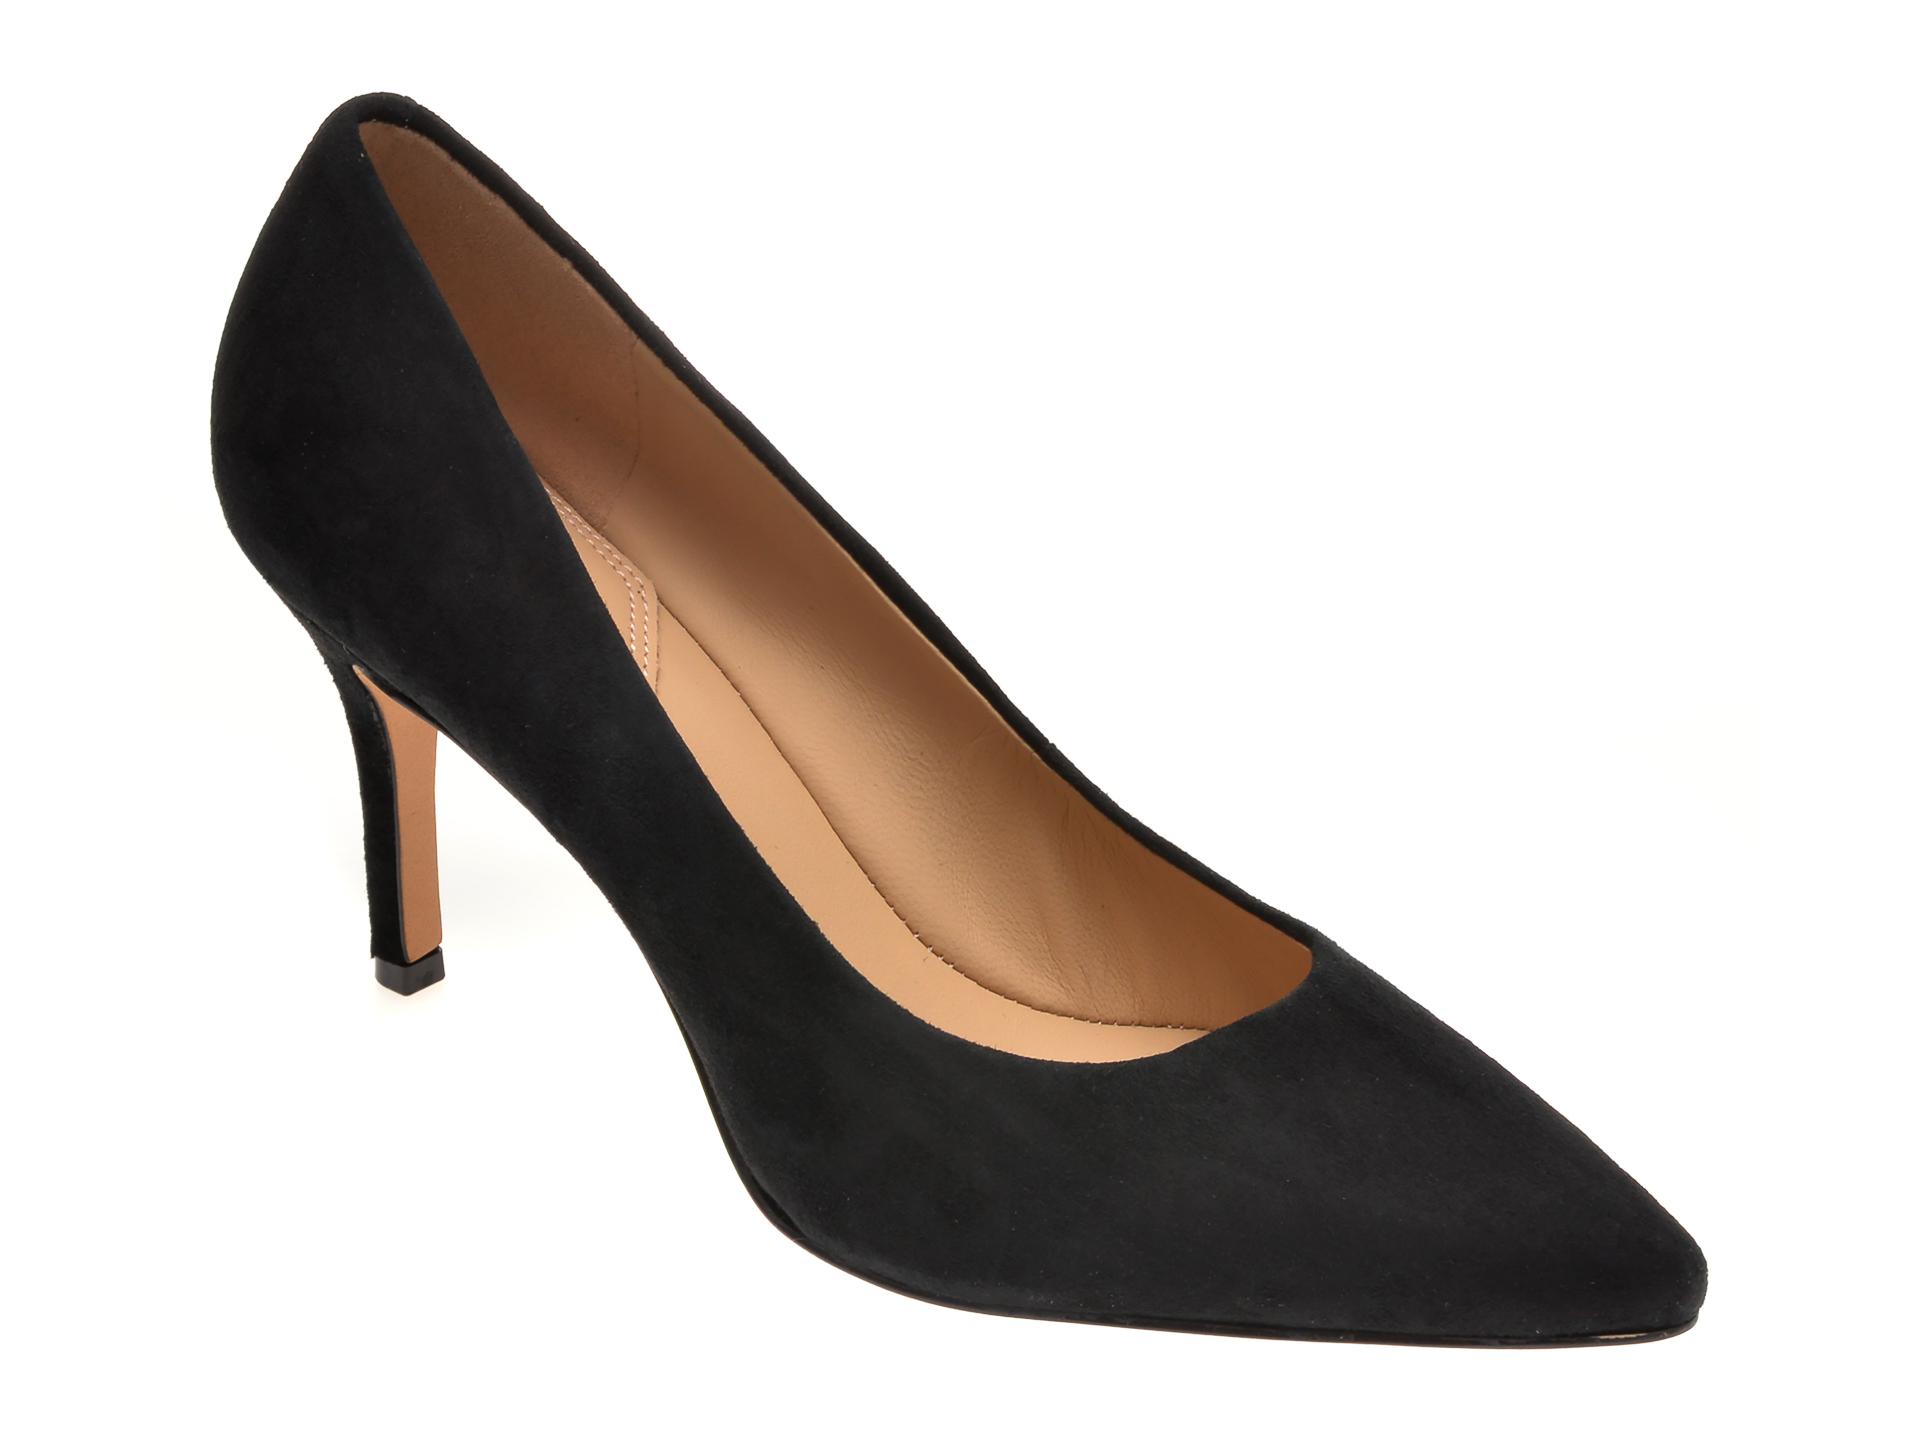 Pantofi ALDO negri, Coronitiflex001, din piele intoarsa imagine otter.ro 2021